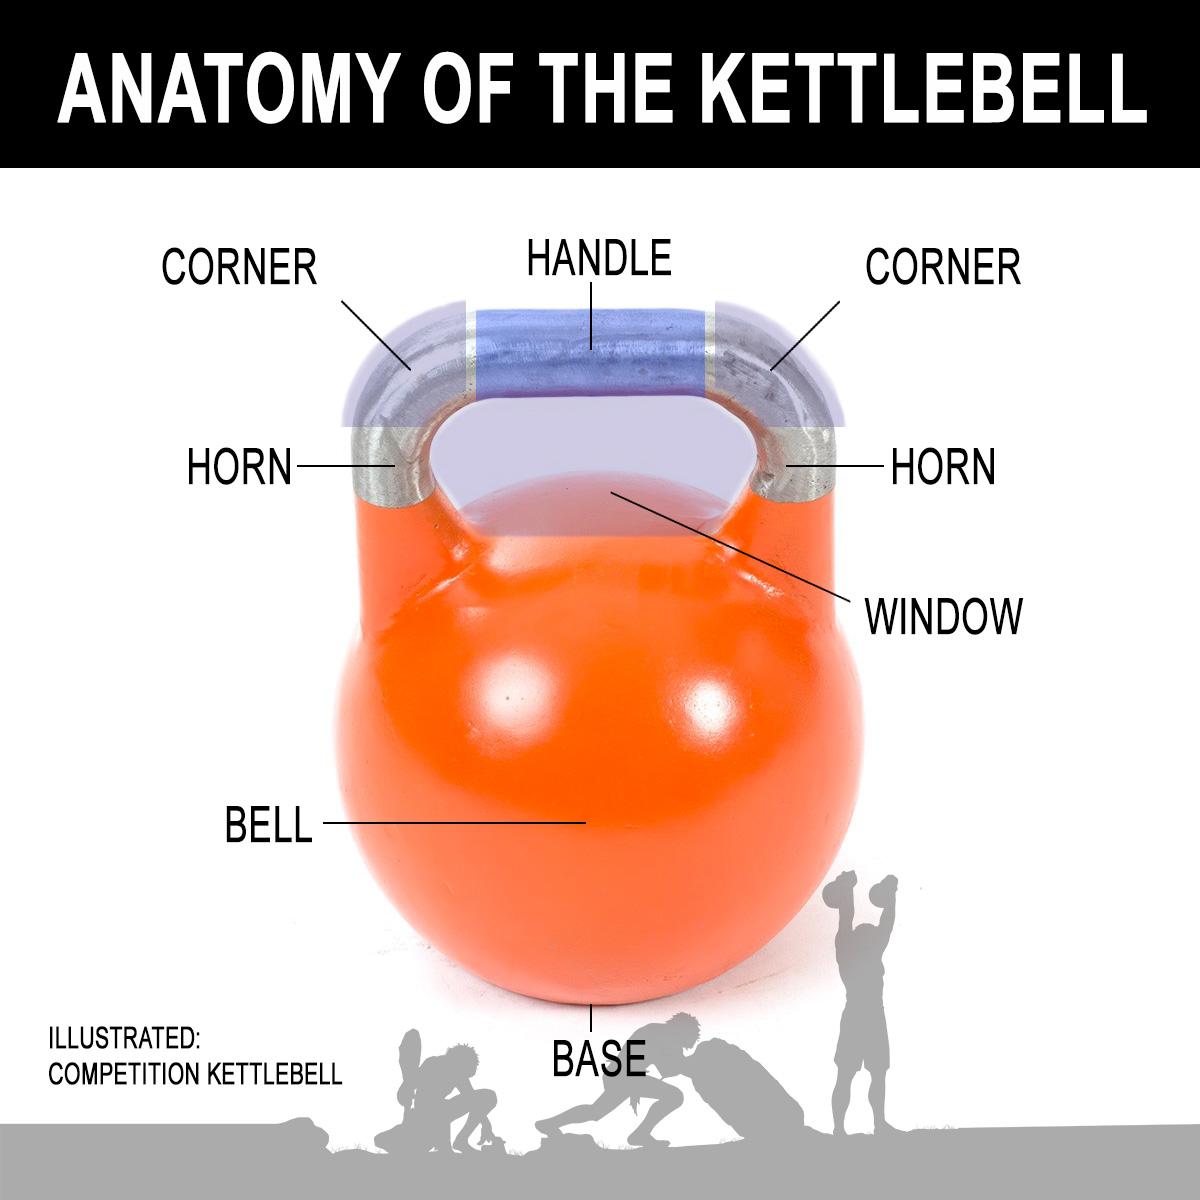 Anatomy of the kettlebell